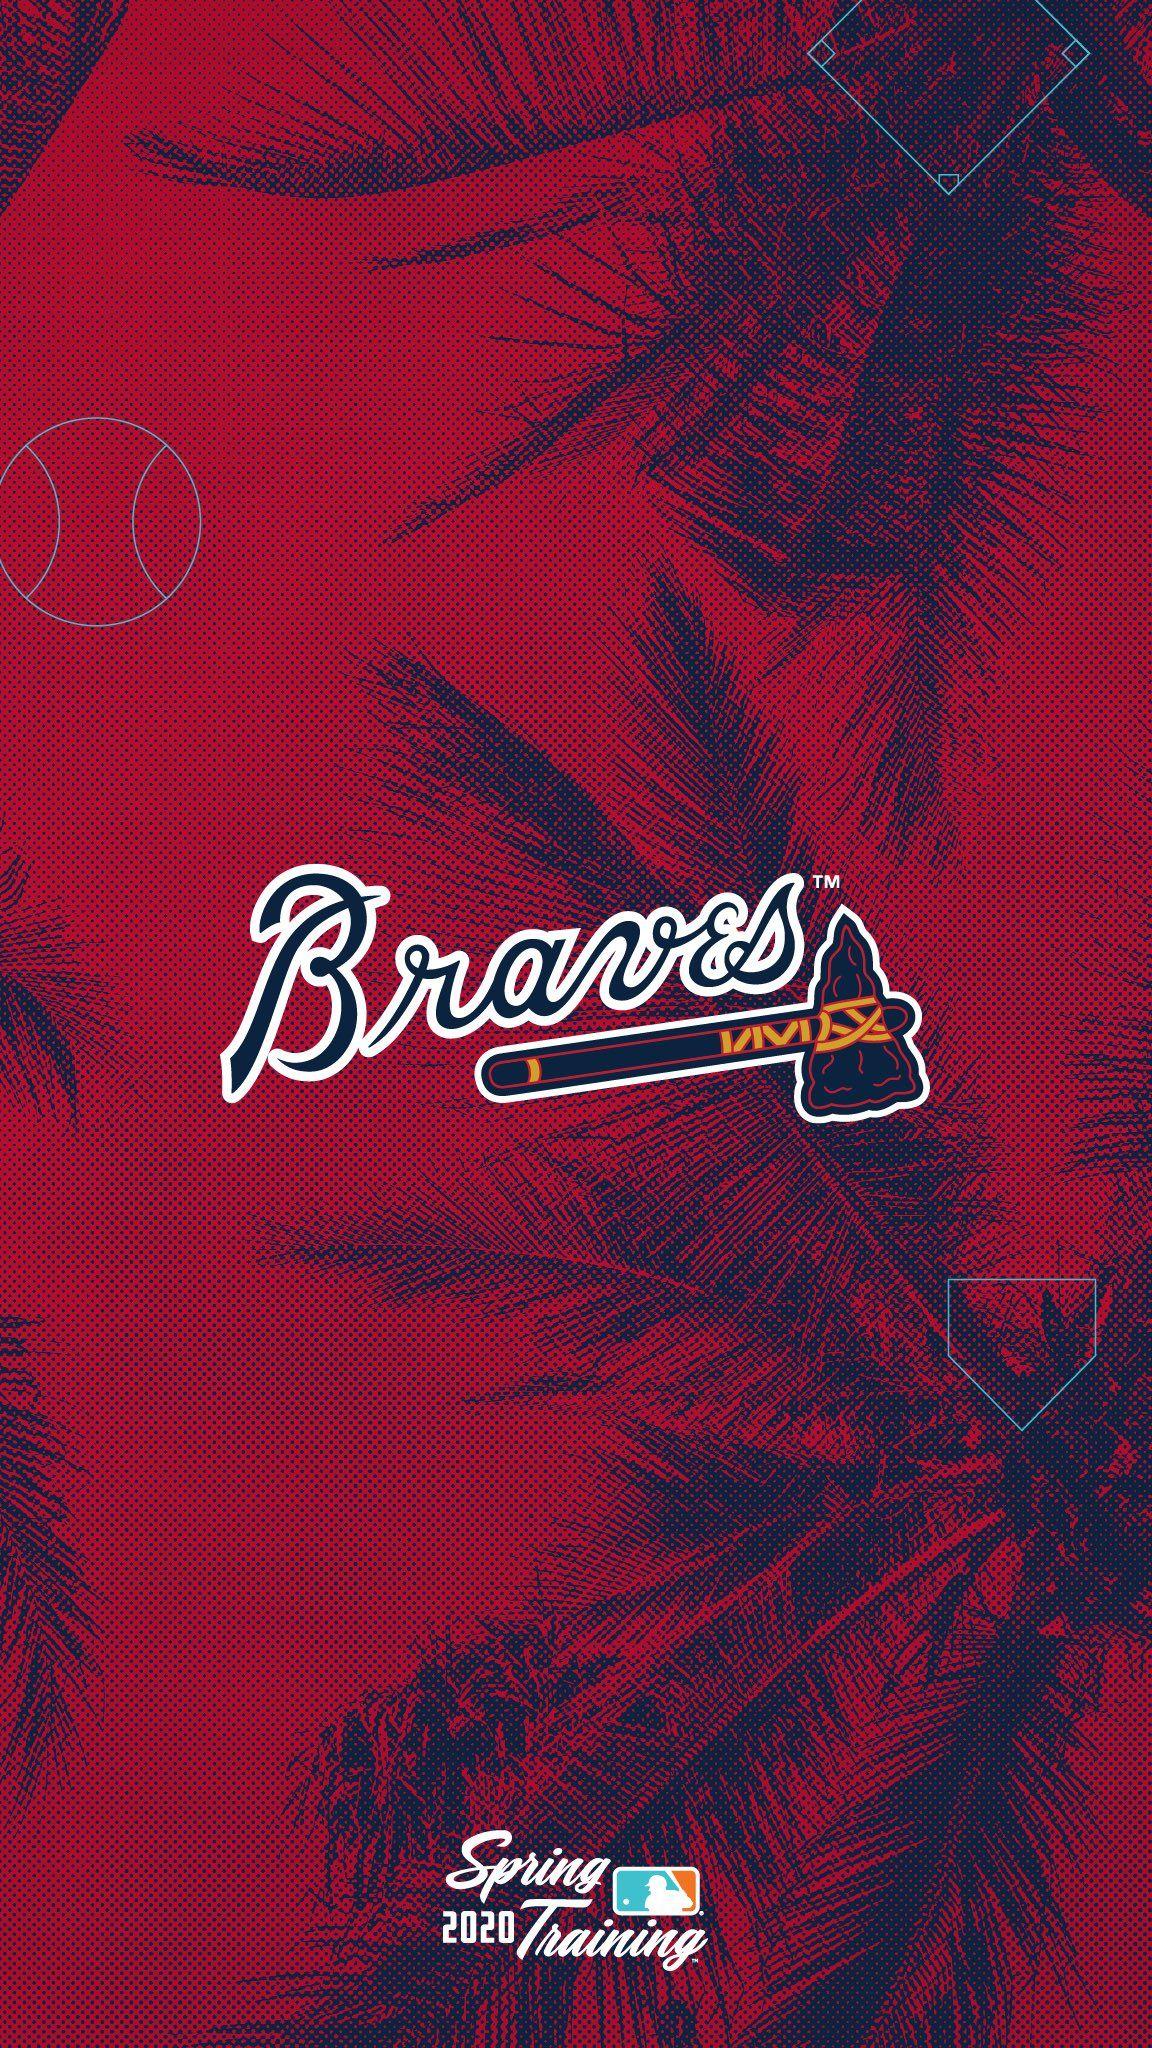 Pin By Nathaniel Guice On Sports City In 2020 Atlanta Braves Wallpaper Atlanta Braves Braves